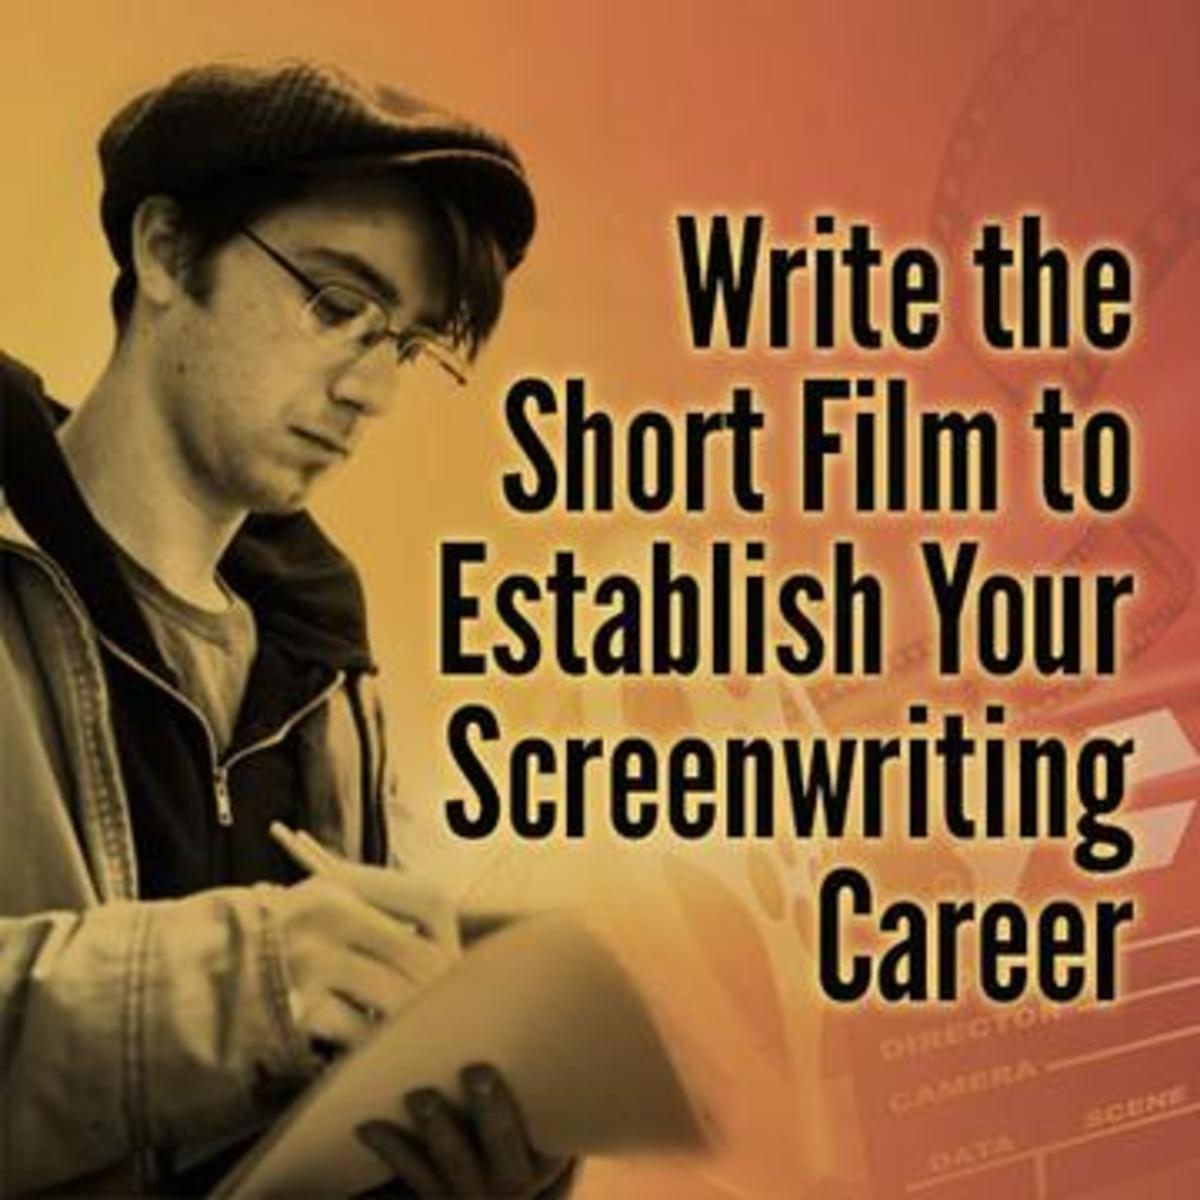 ws_shortfilm-career-500_360x